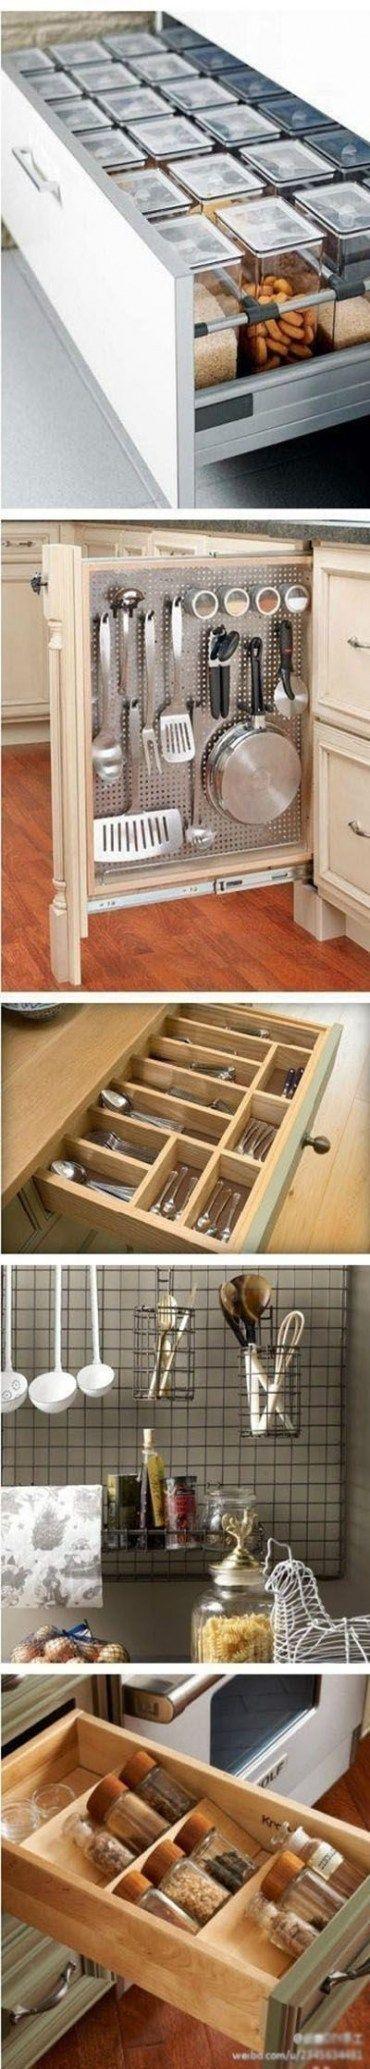 New diy organization drawers spice racks ideas #diy ...